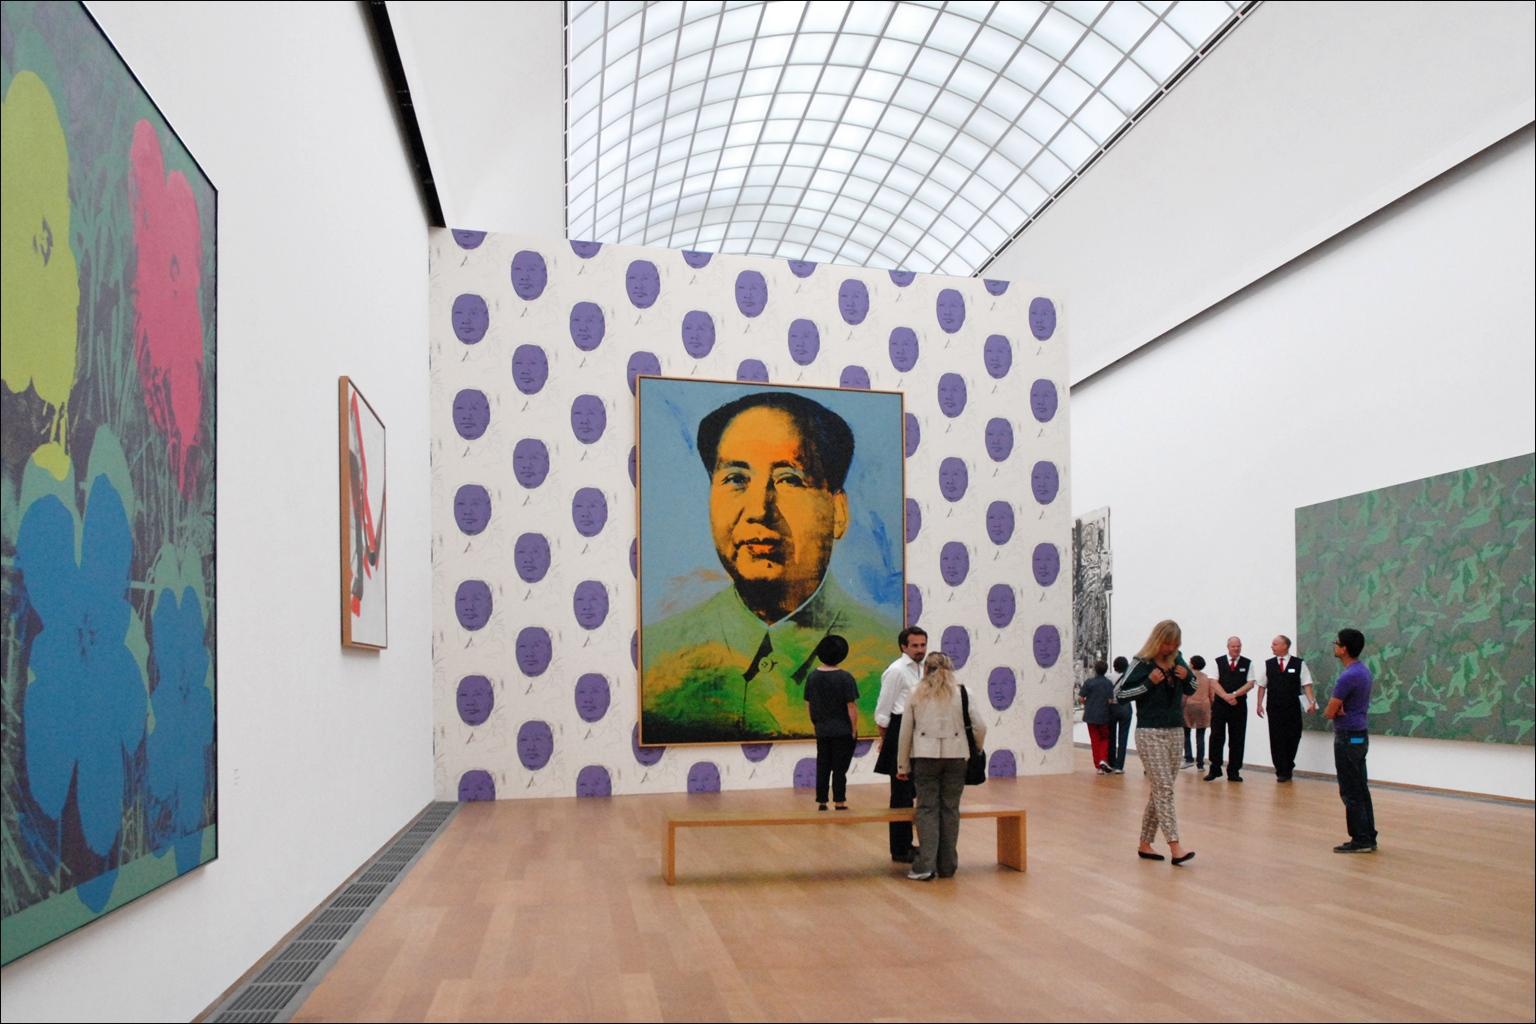 Opere di Andy Warhol - Mao Tse Tung